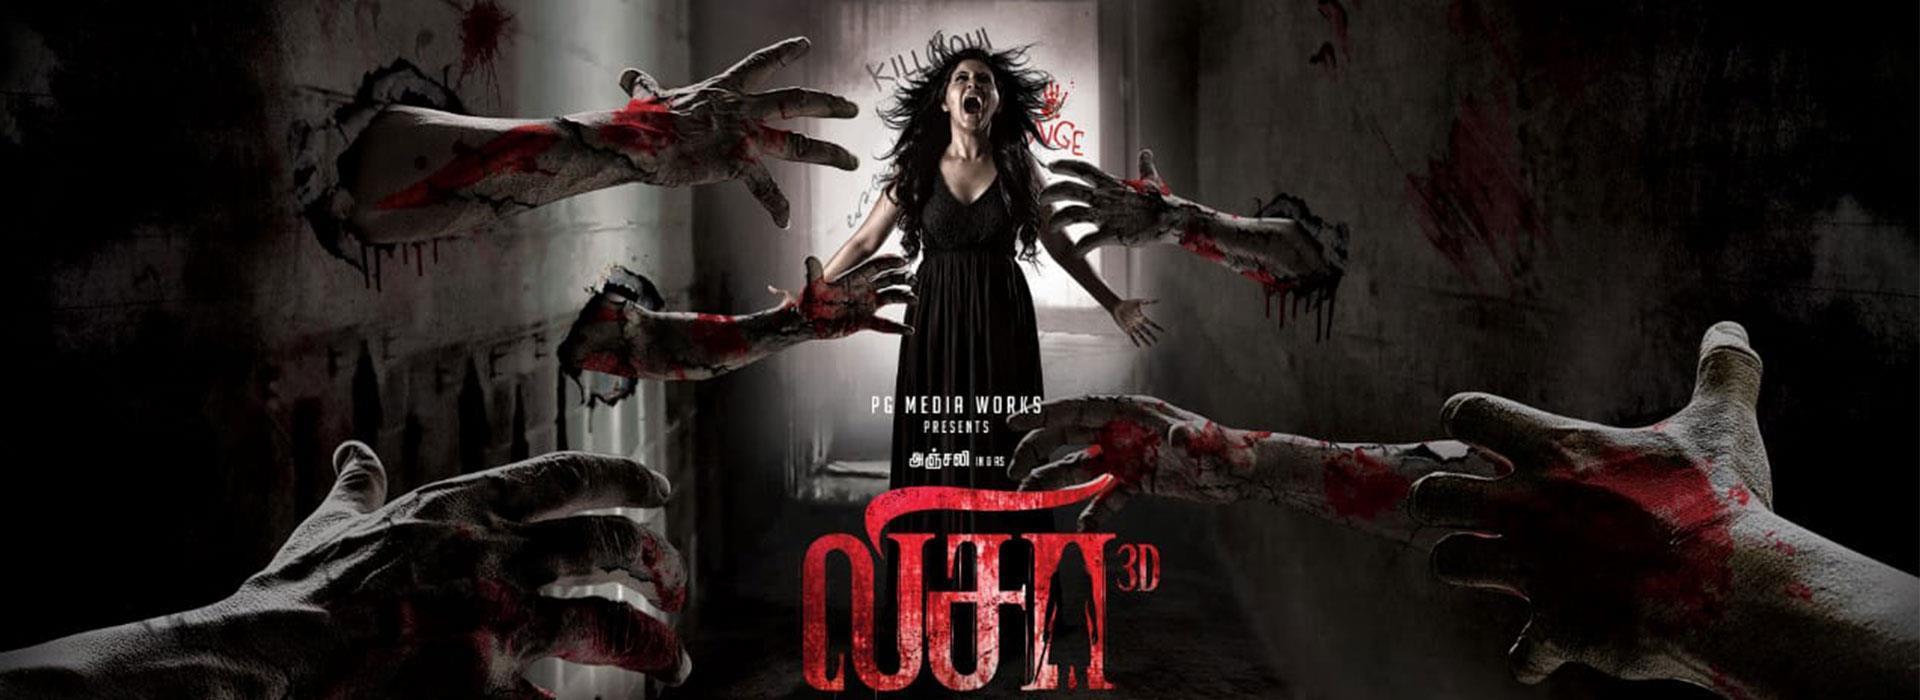 Book Movies Tickets Online In Oman| Q - tickets